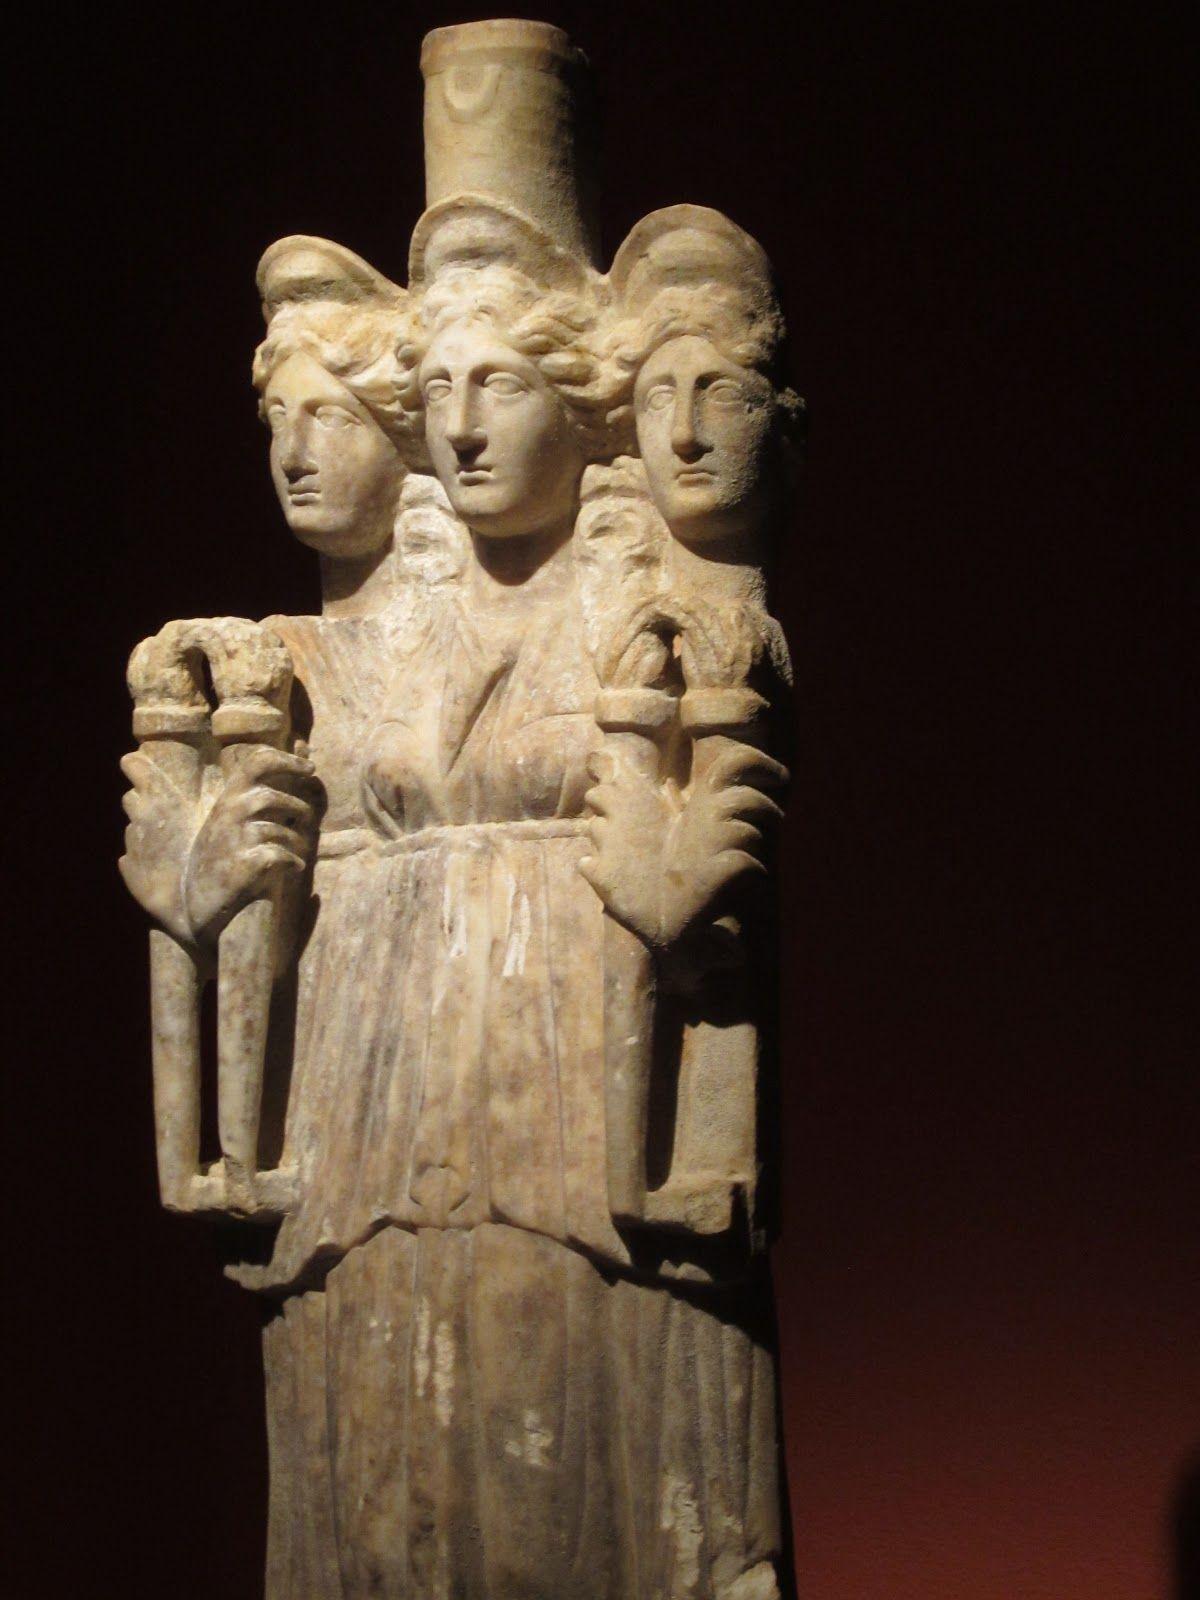 demeter goddess - Google Search | Greek statue, Statue ...